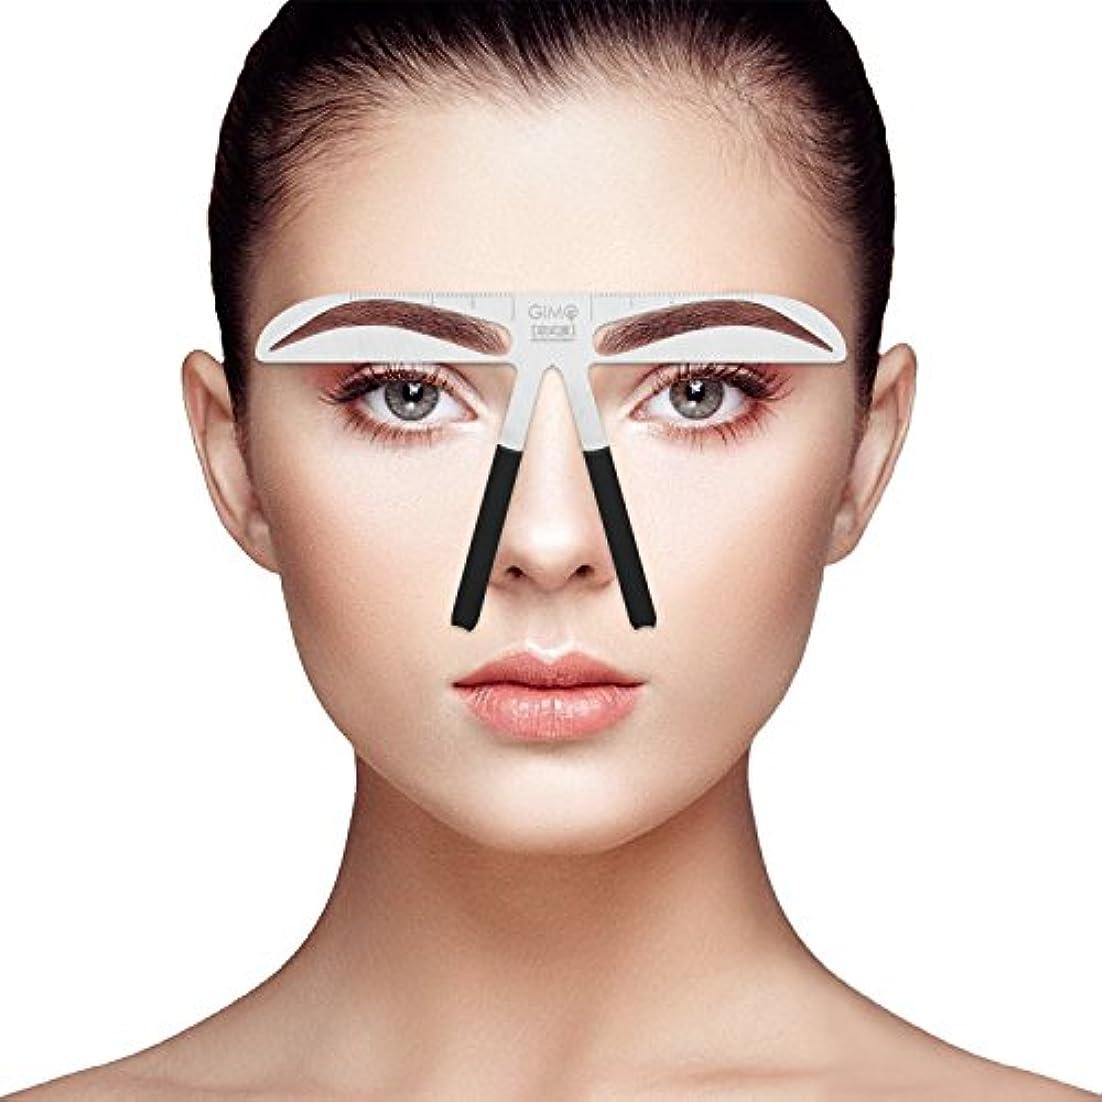 ELEVEN EVER眉毛ステンシルな化粧入れ墨の眉ツール(欧式)